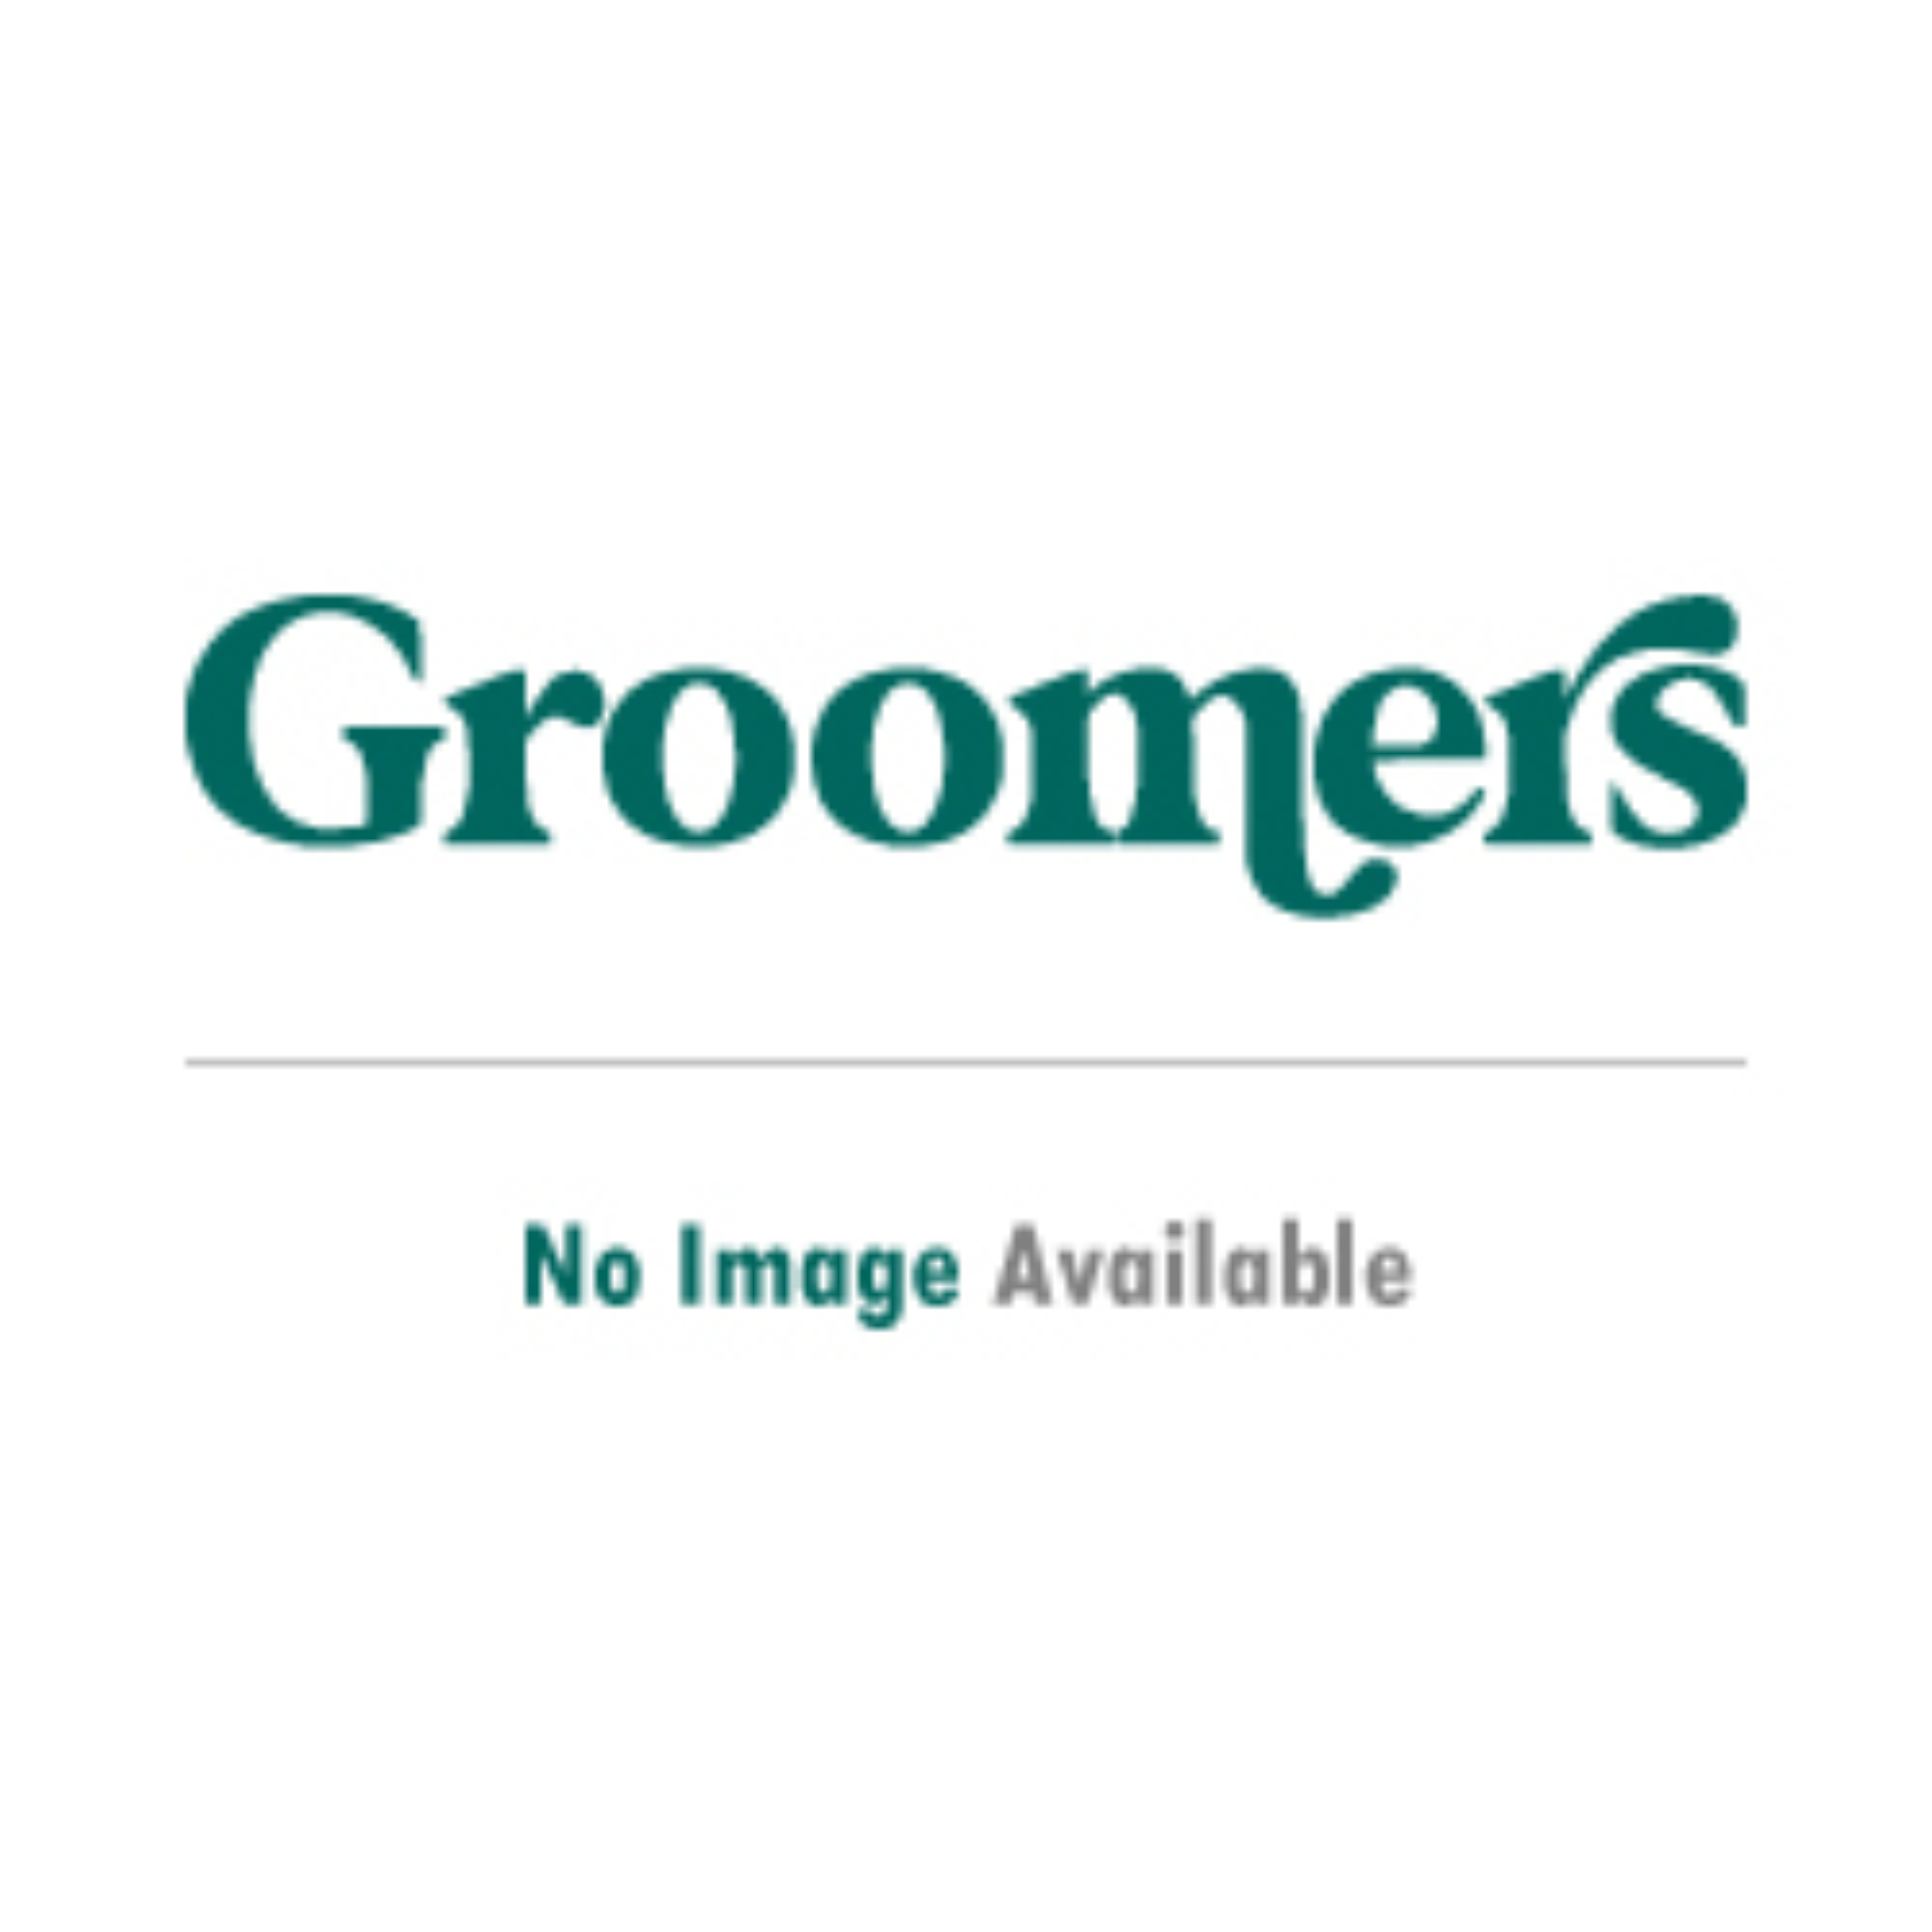 Groomers Evening Primrose Oil Food Supplement - 500ml